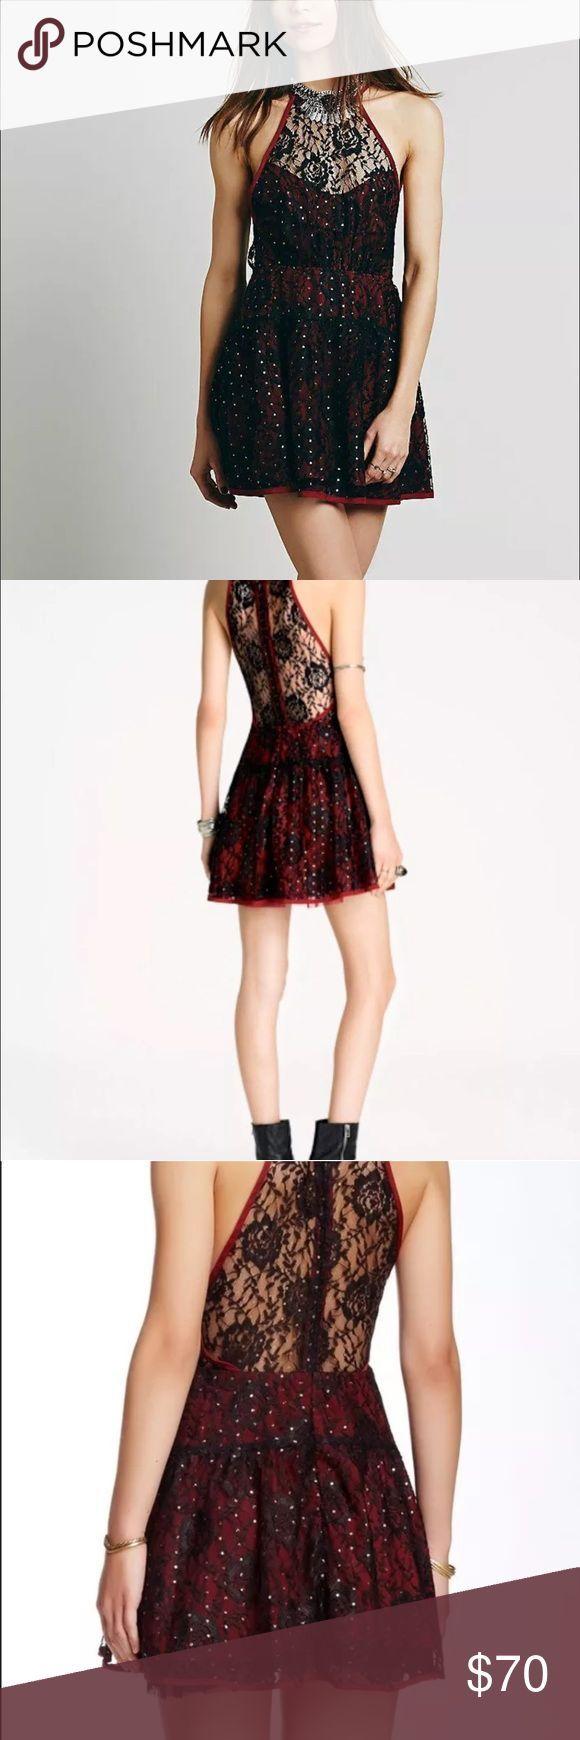 Lace dress mini golden